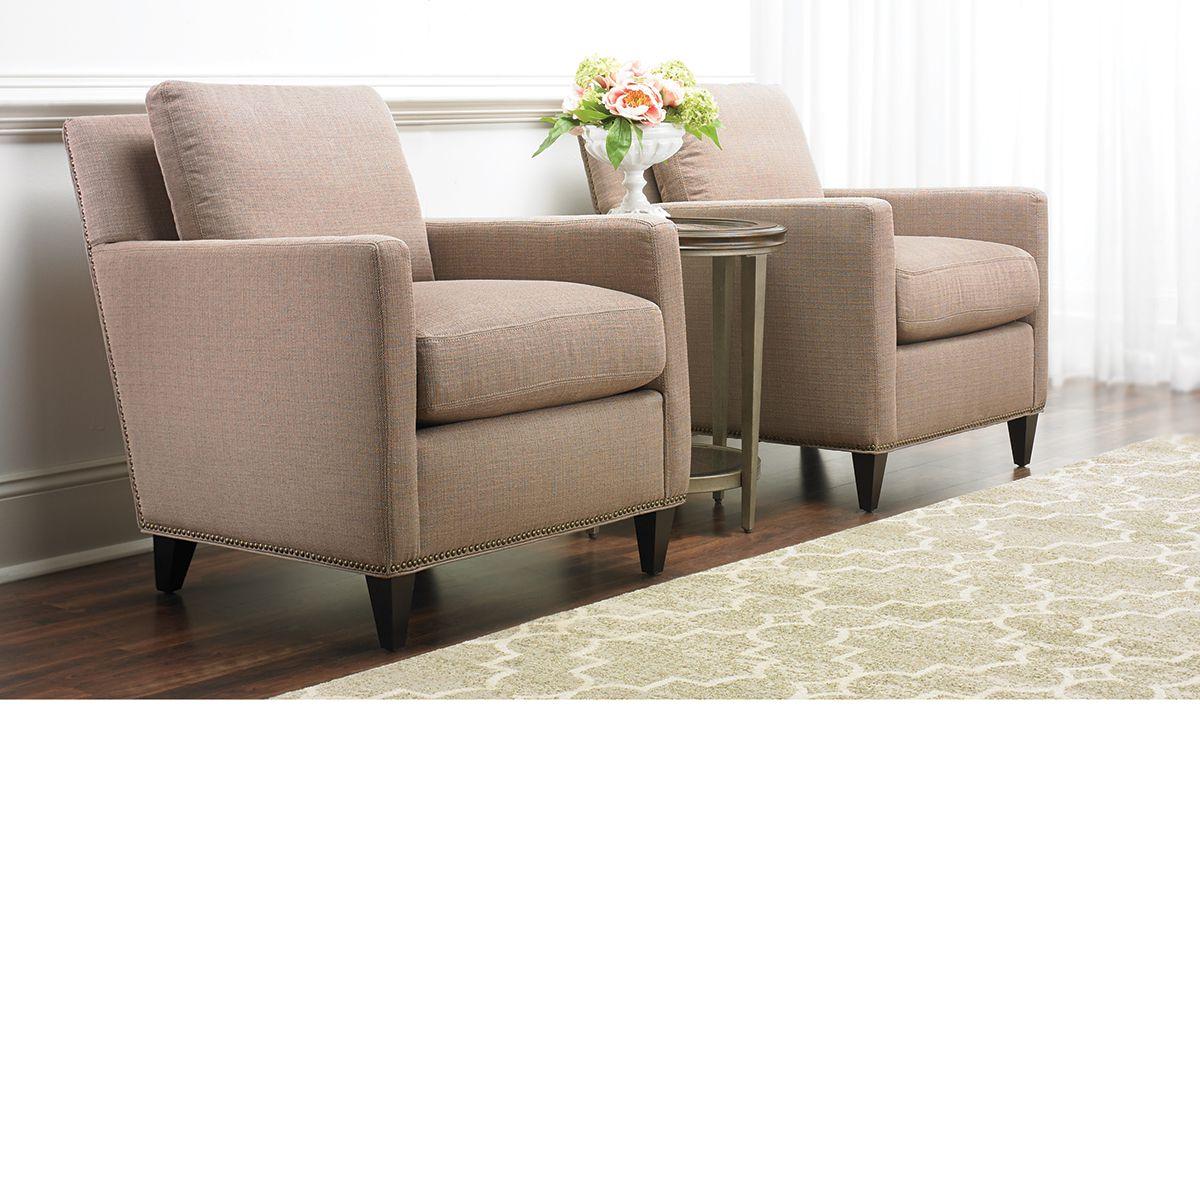 Wholesale Furniture Outlet Newport: The Dump Furniture - Newport Parker Chair